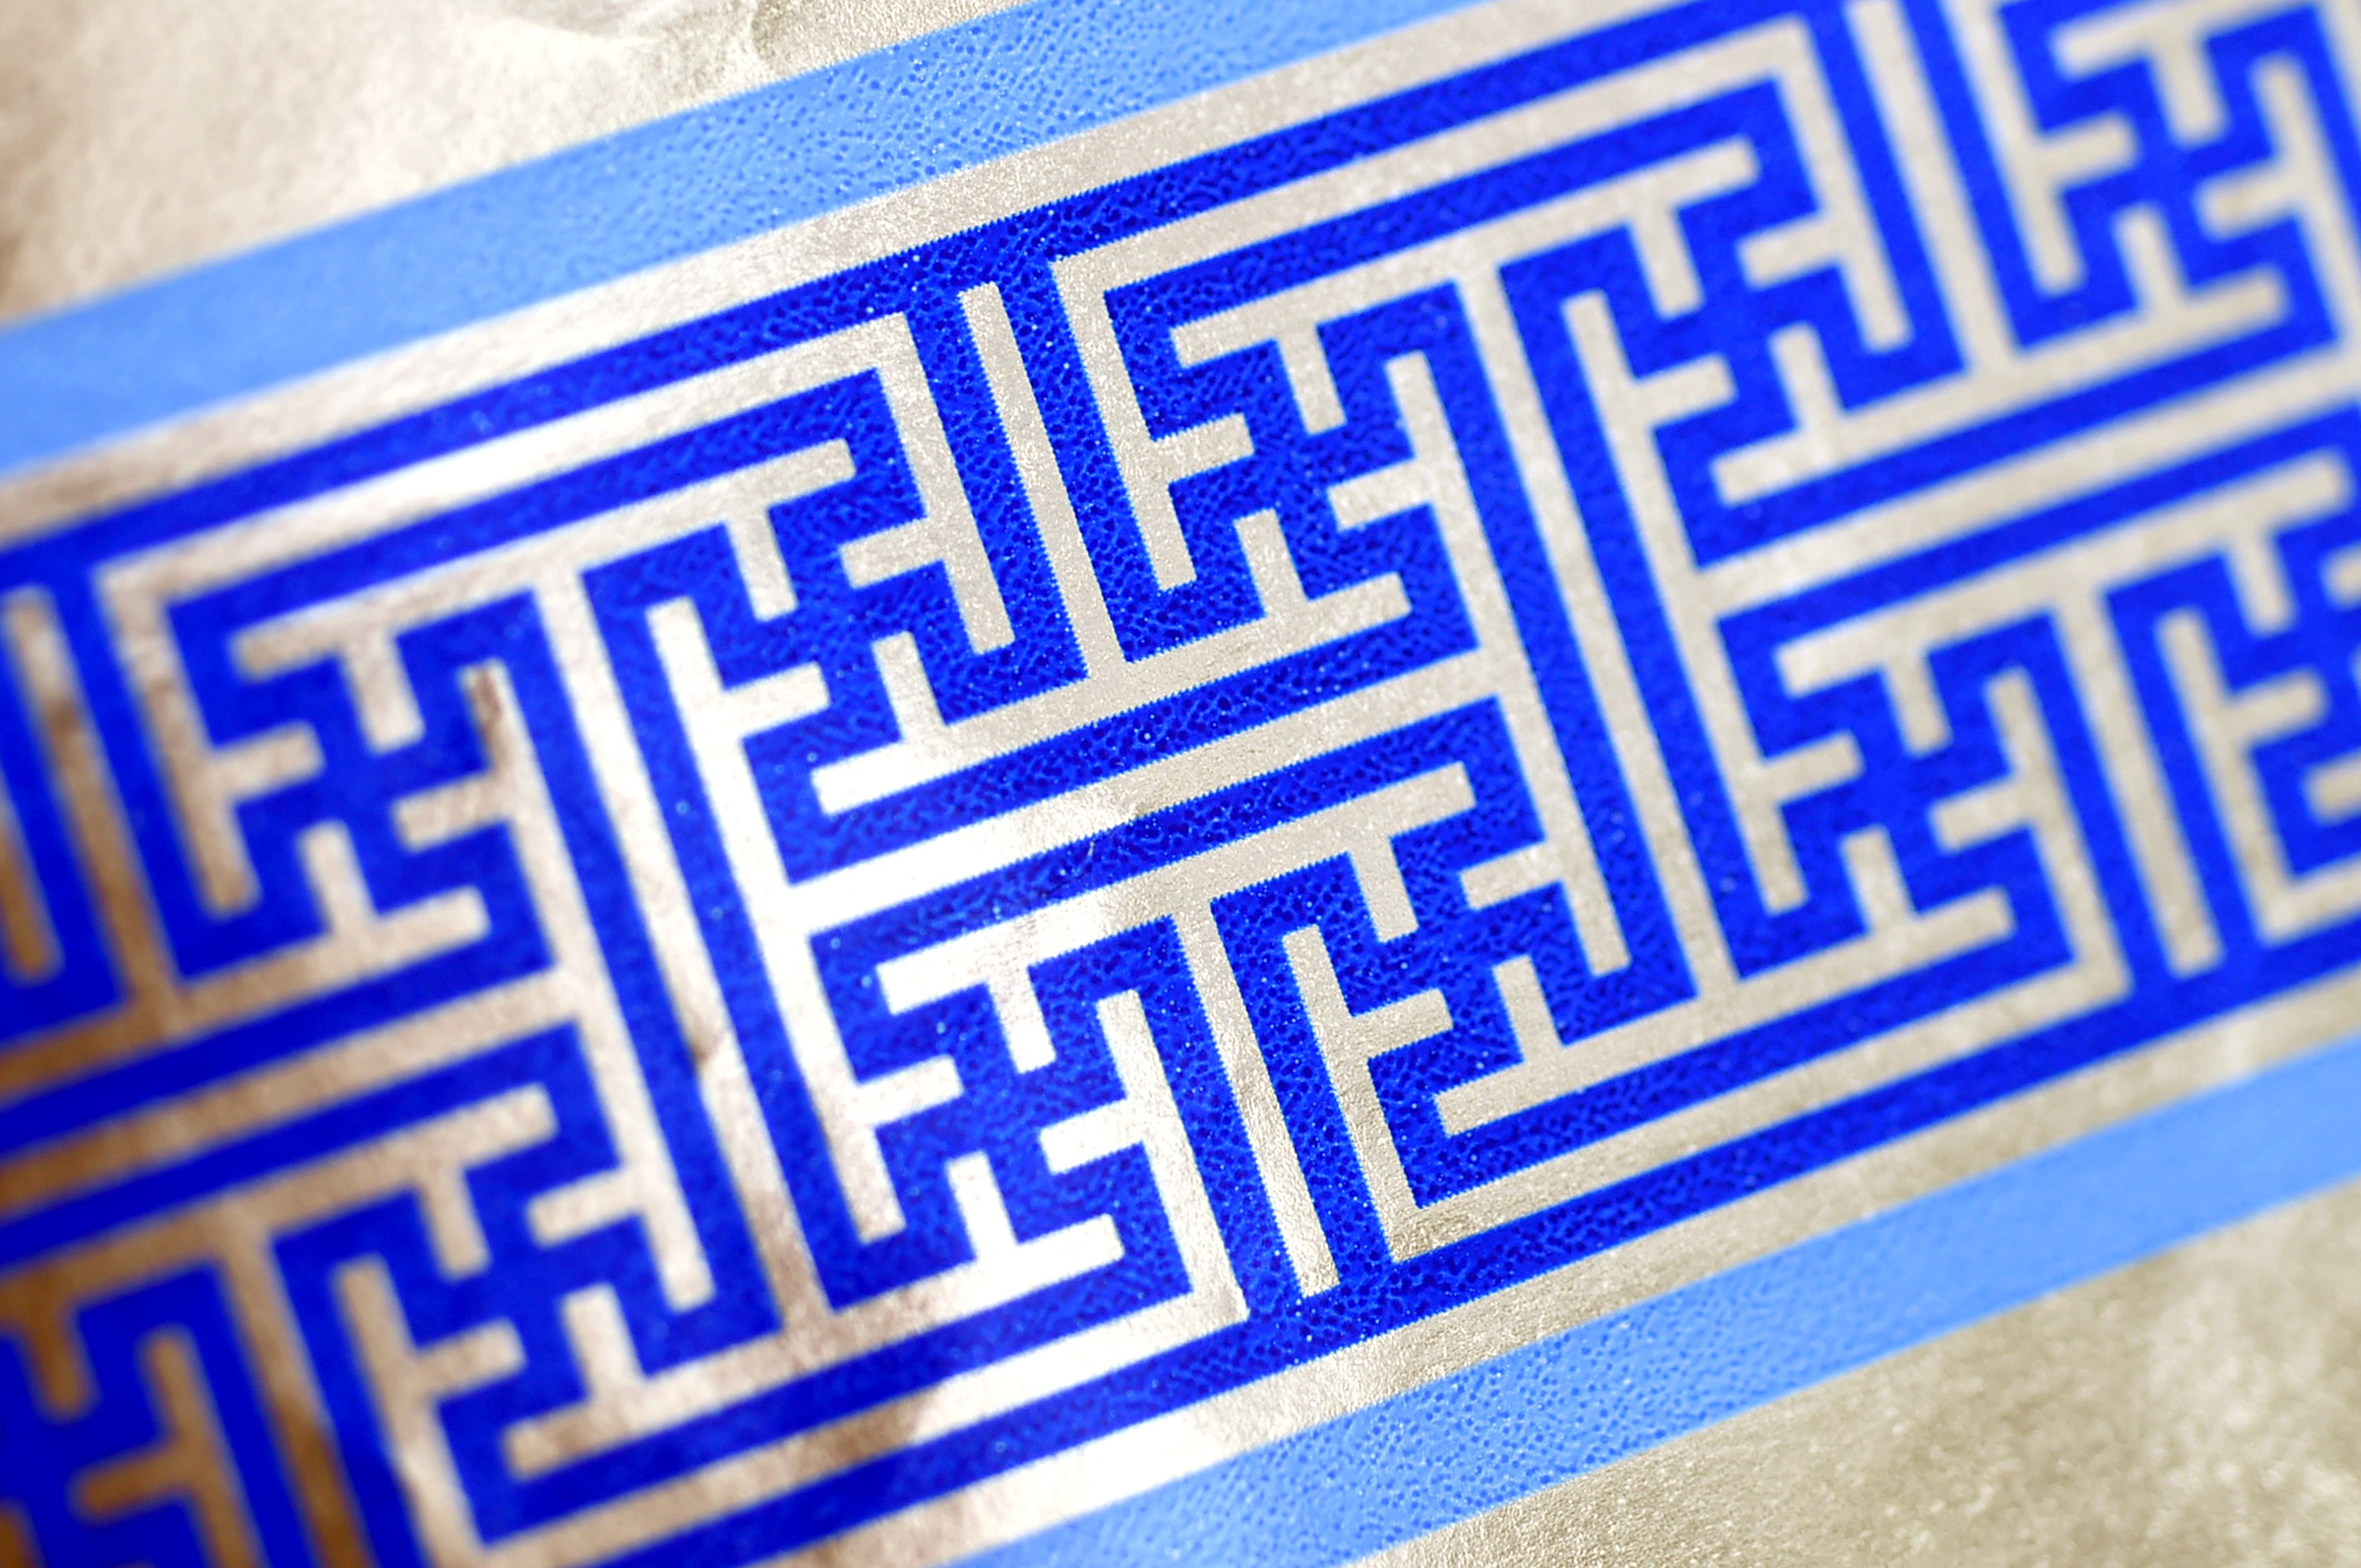 Cheryl Shapiro displays the Hanukkah gift wrap with a swastika-like pattern she found at Walgreens in Northridge, Calif., Monday,  Dec. 8, 2014